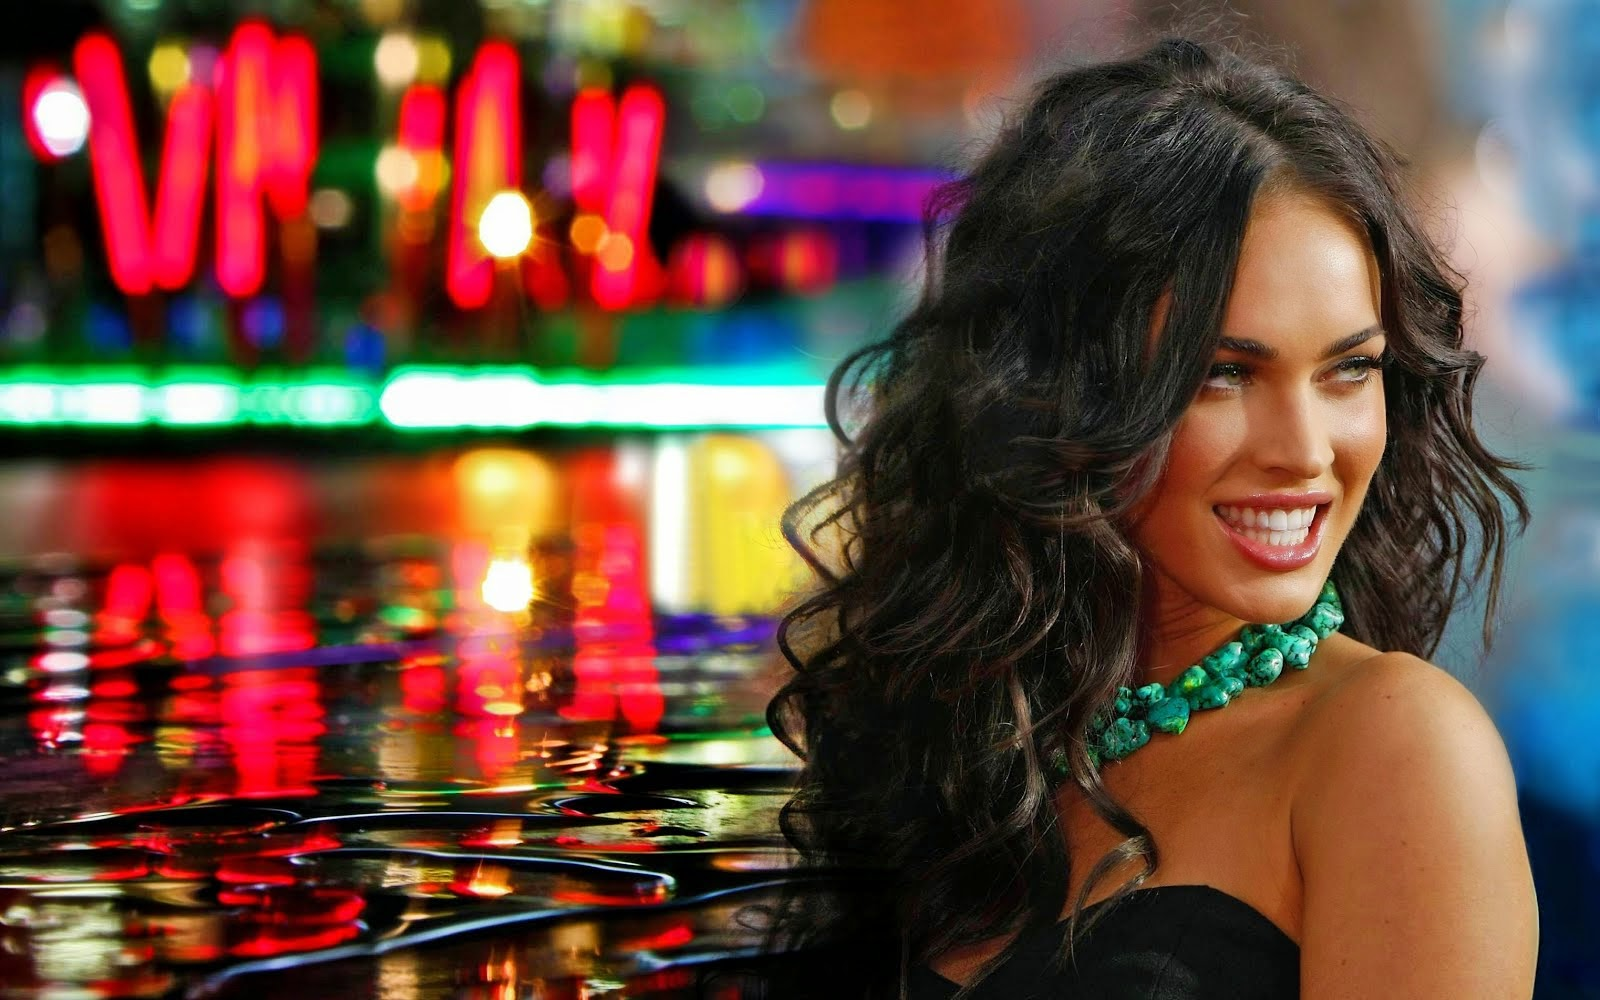 Megan Fox HD Wallpapers | HD Wallpapers | Download Free ...